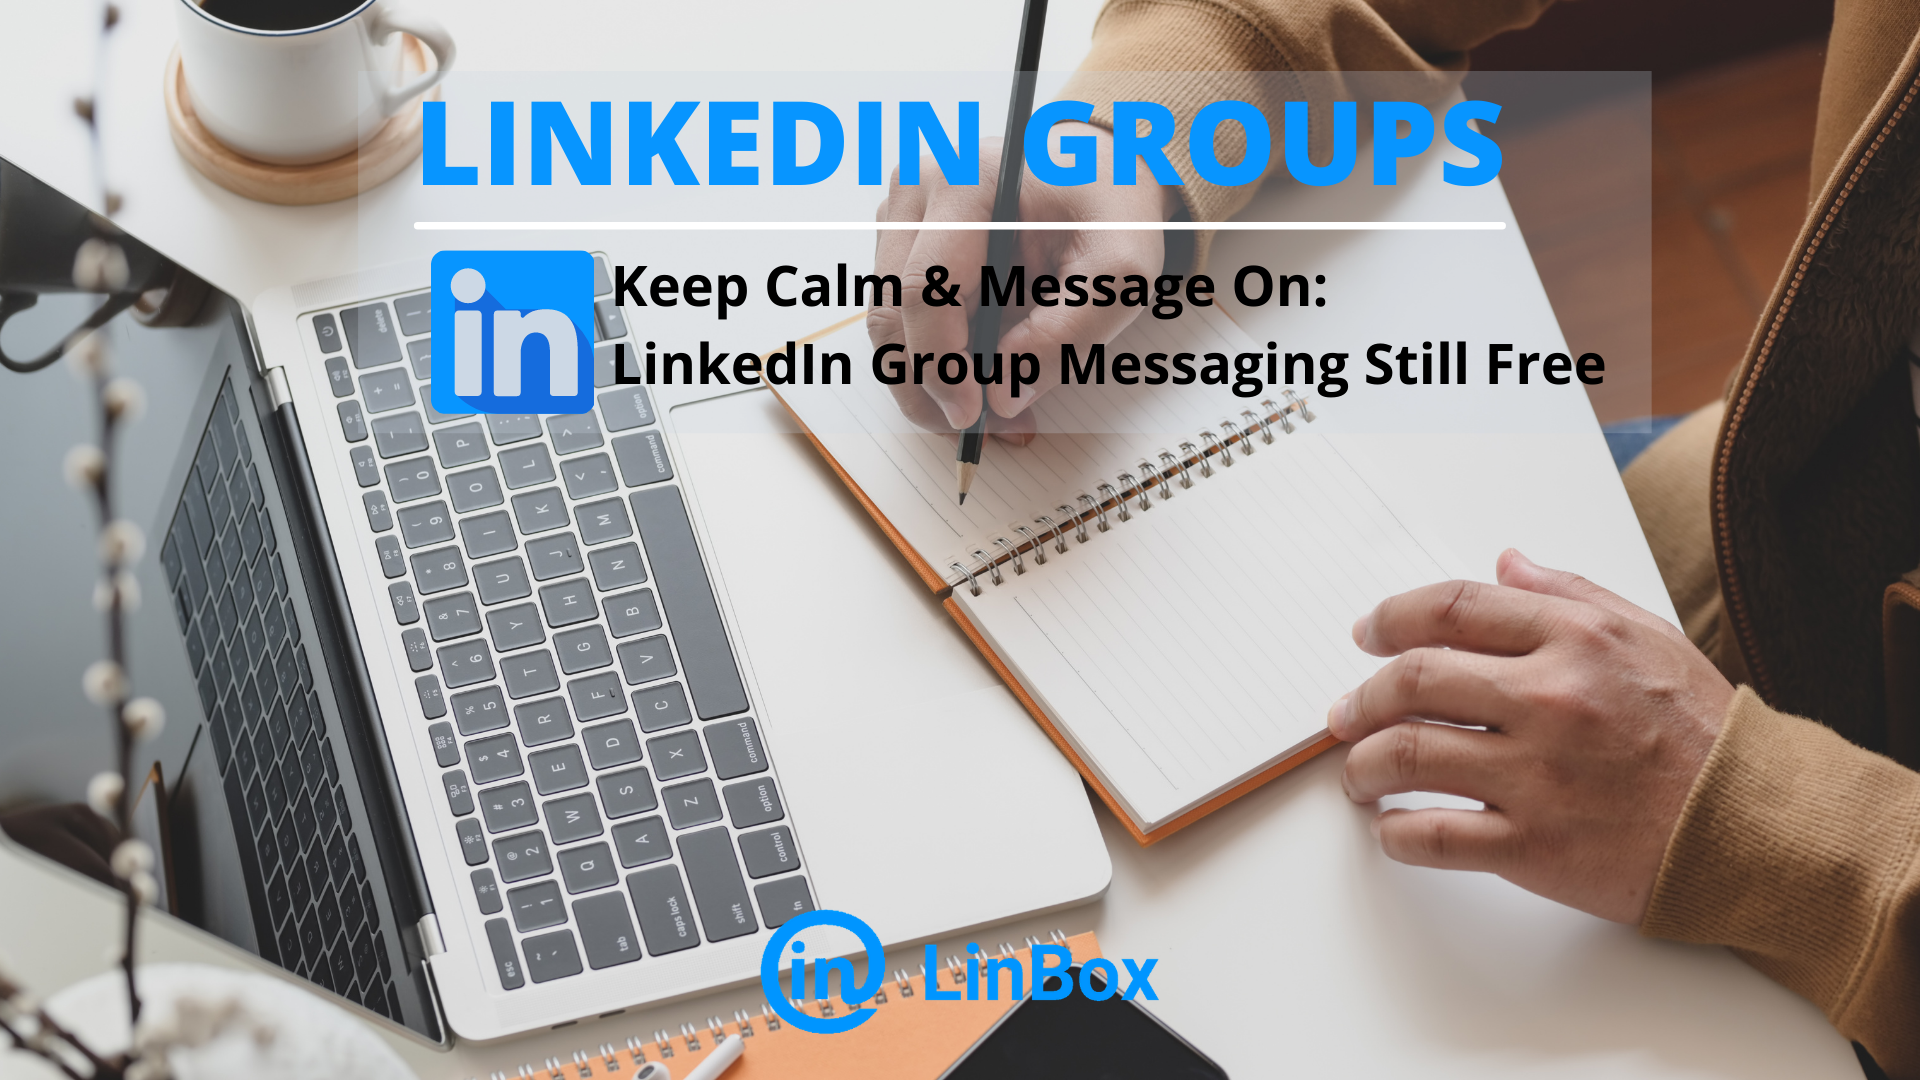 Linkedin Groups Messaging